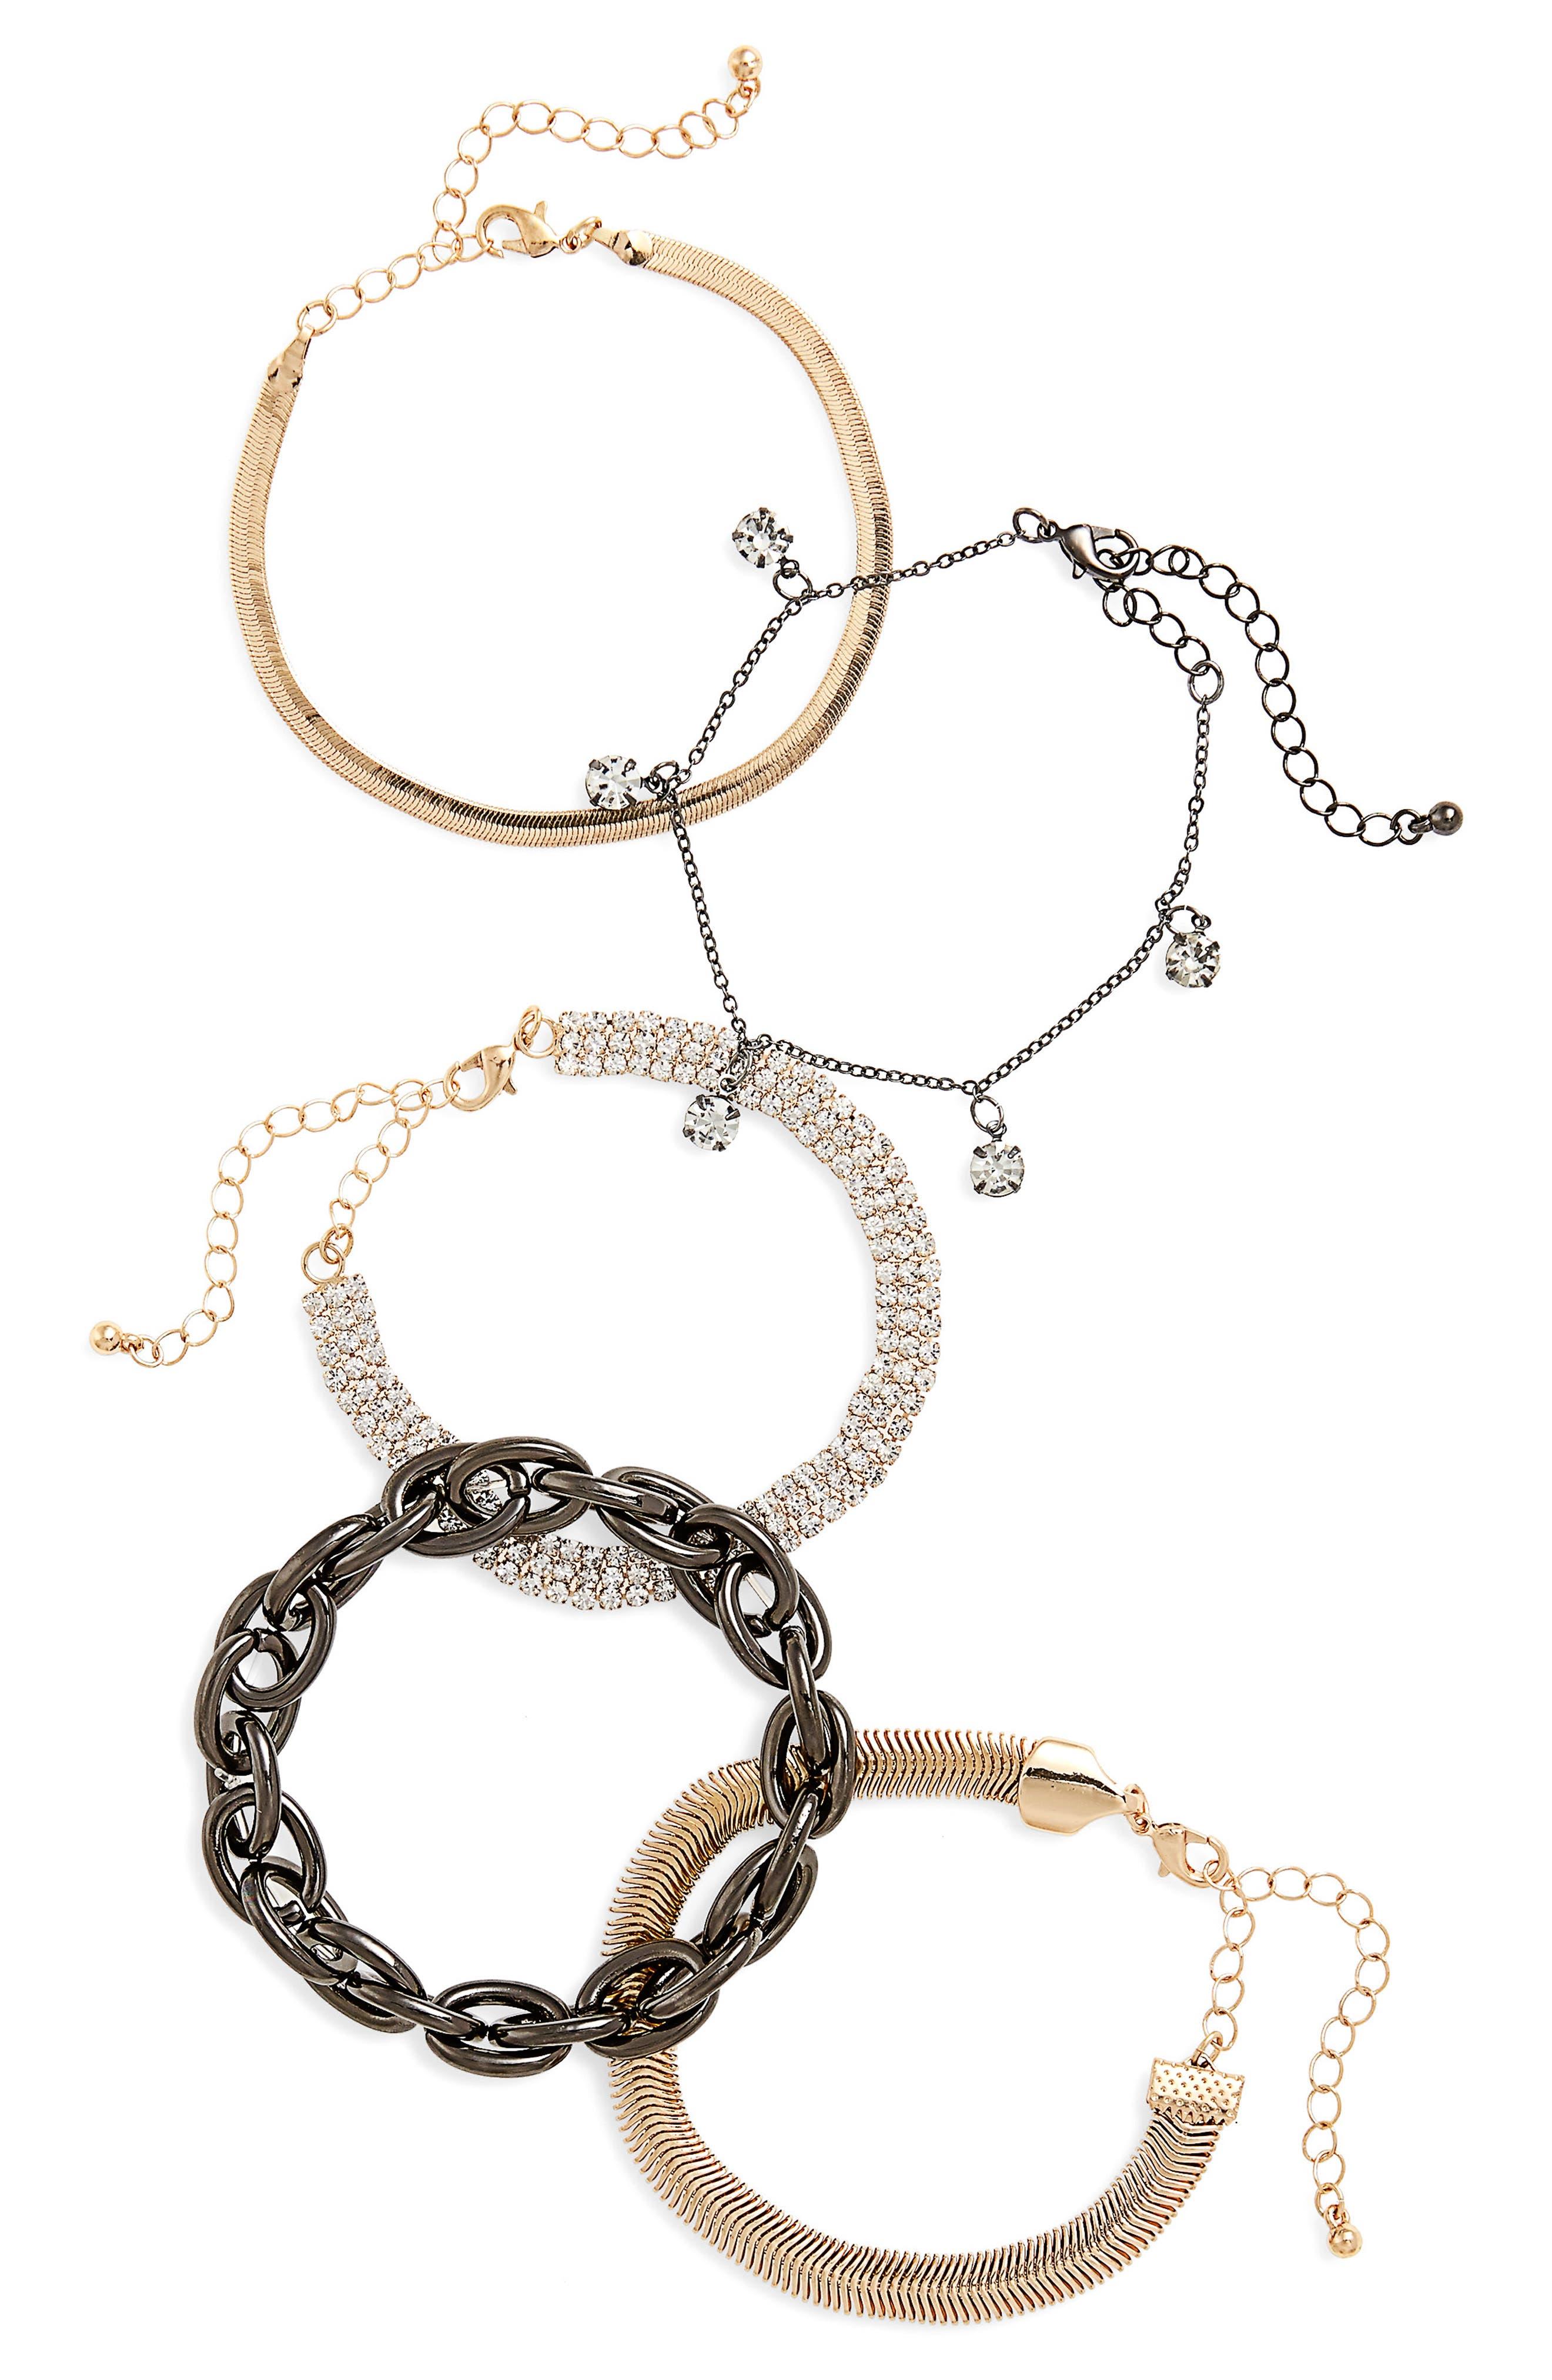 5-Pack Crystal Bracelets,                             Main thumbnail 1, color,                             710